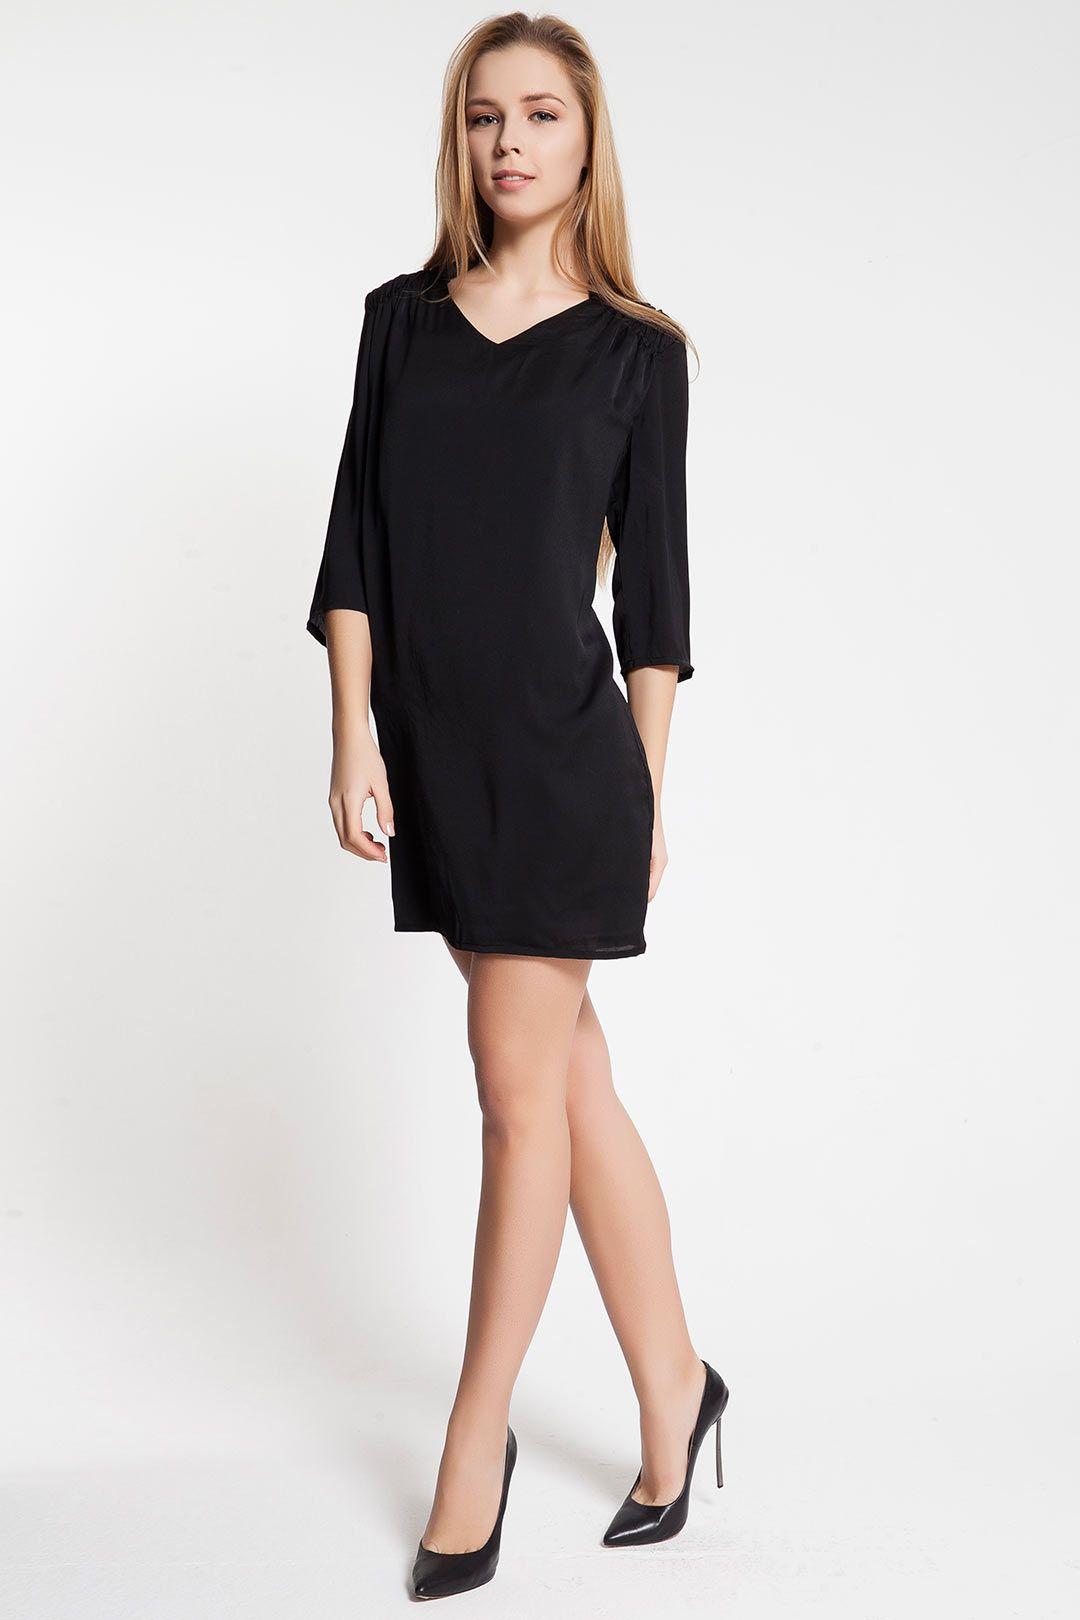 7ac47b1d2b6b7 Vero Moda HILO 3/4 SHORT DRESS Siyah Elbise :: 49.00 TL (KDV dahil ...